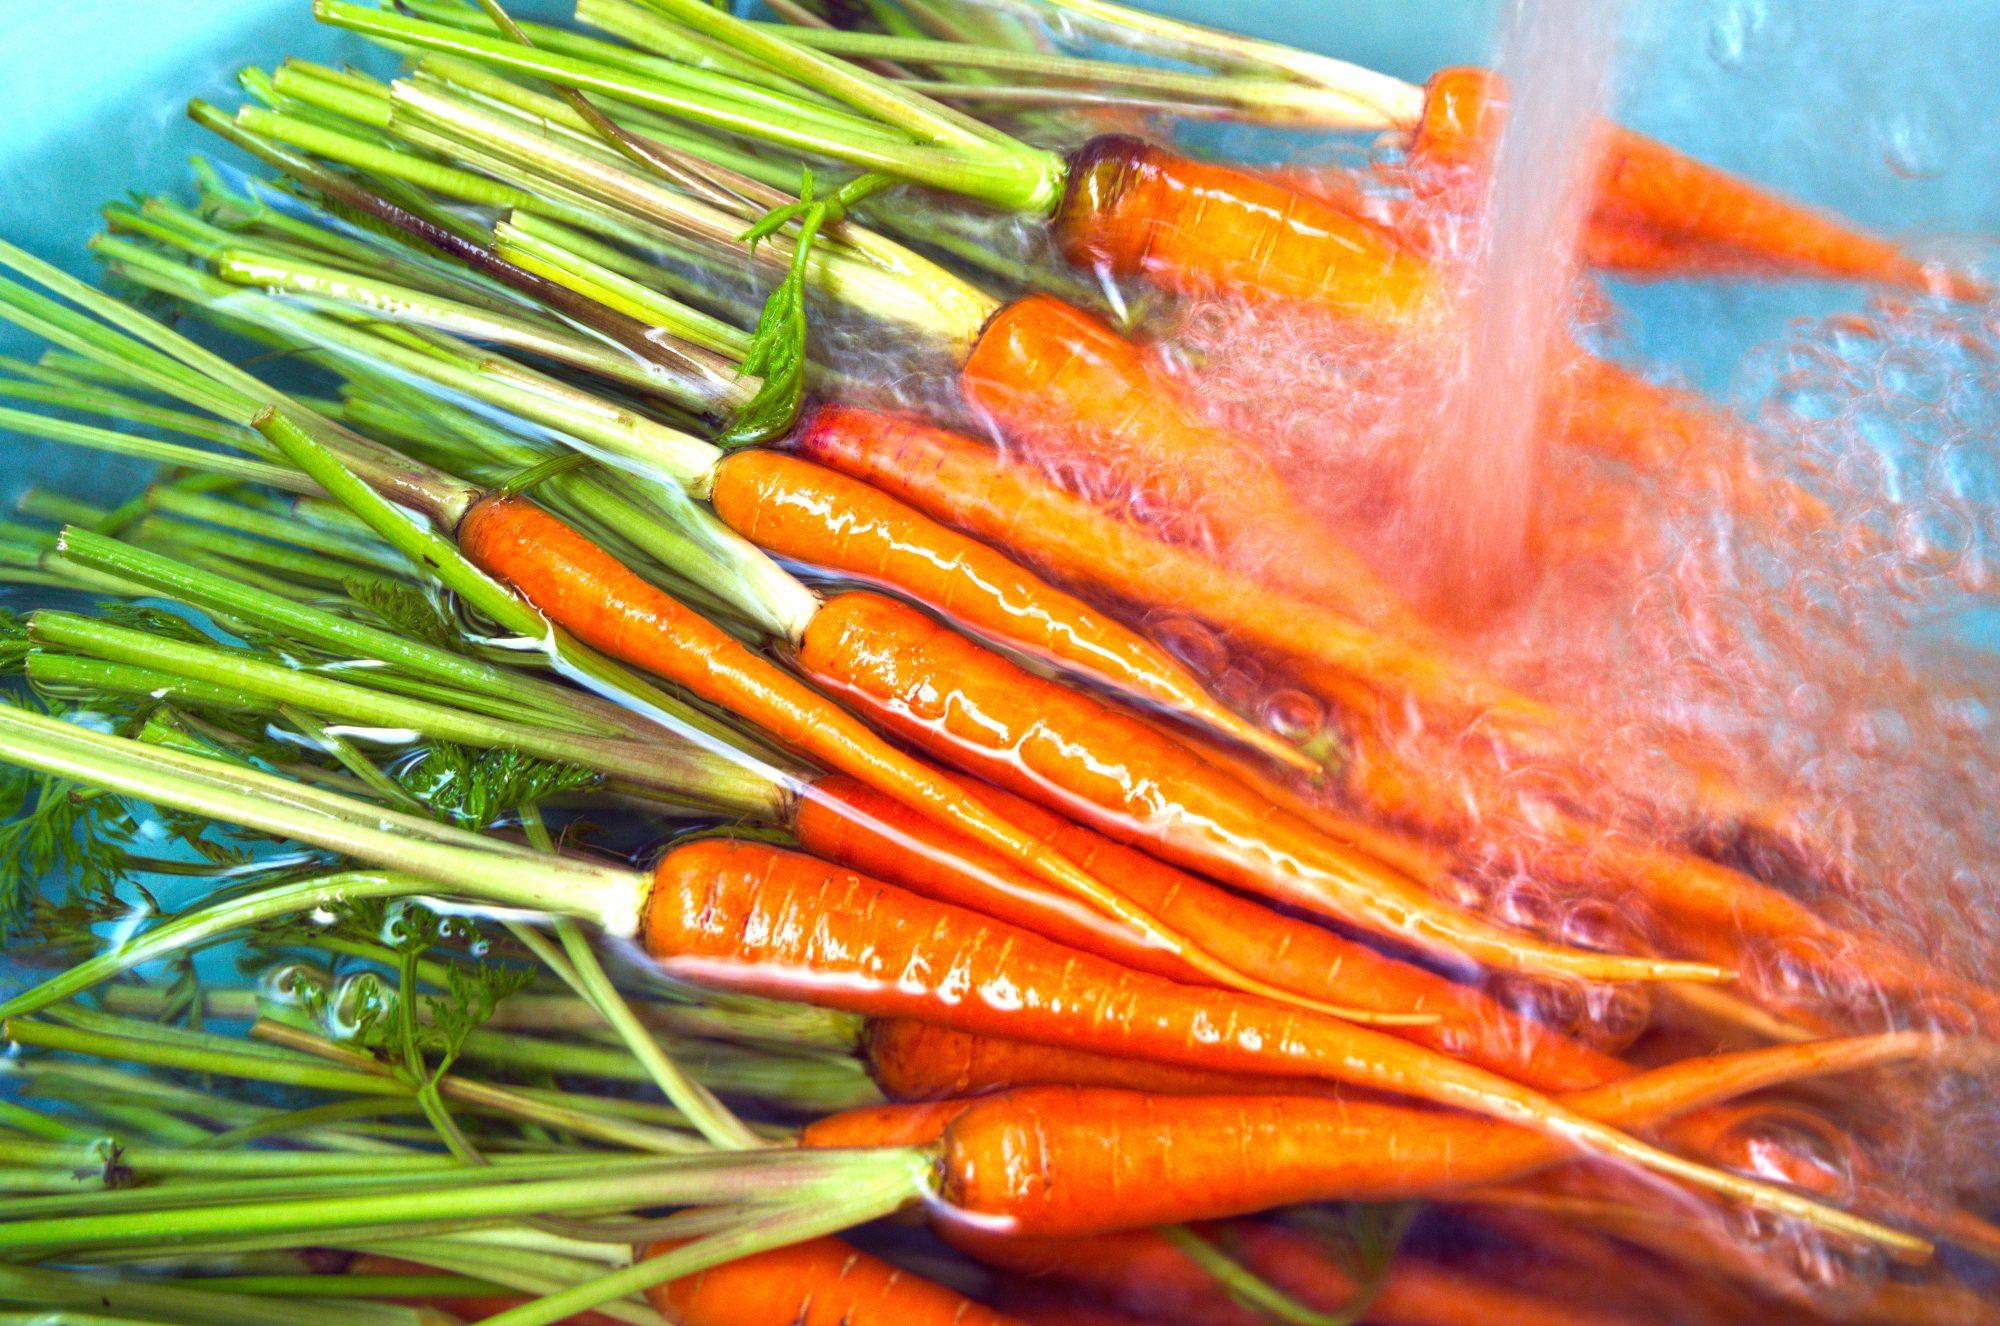 Carrots in Water